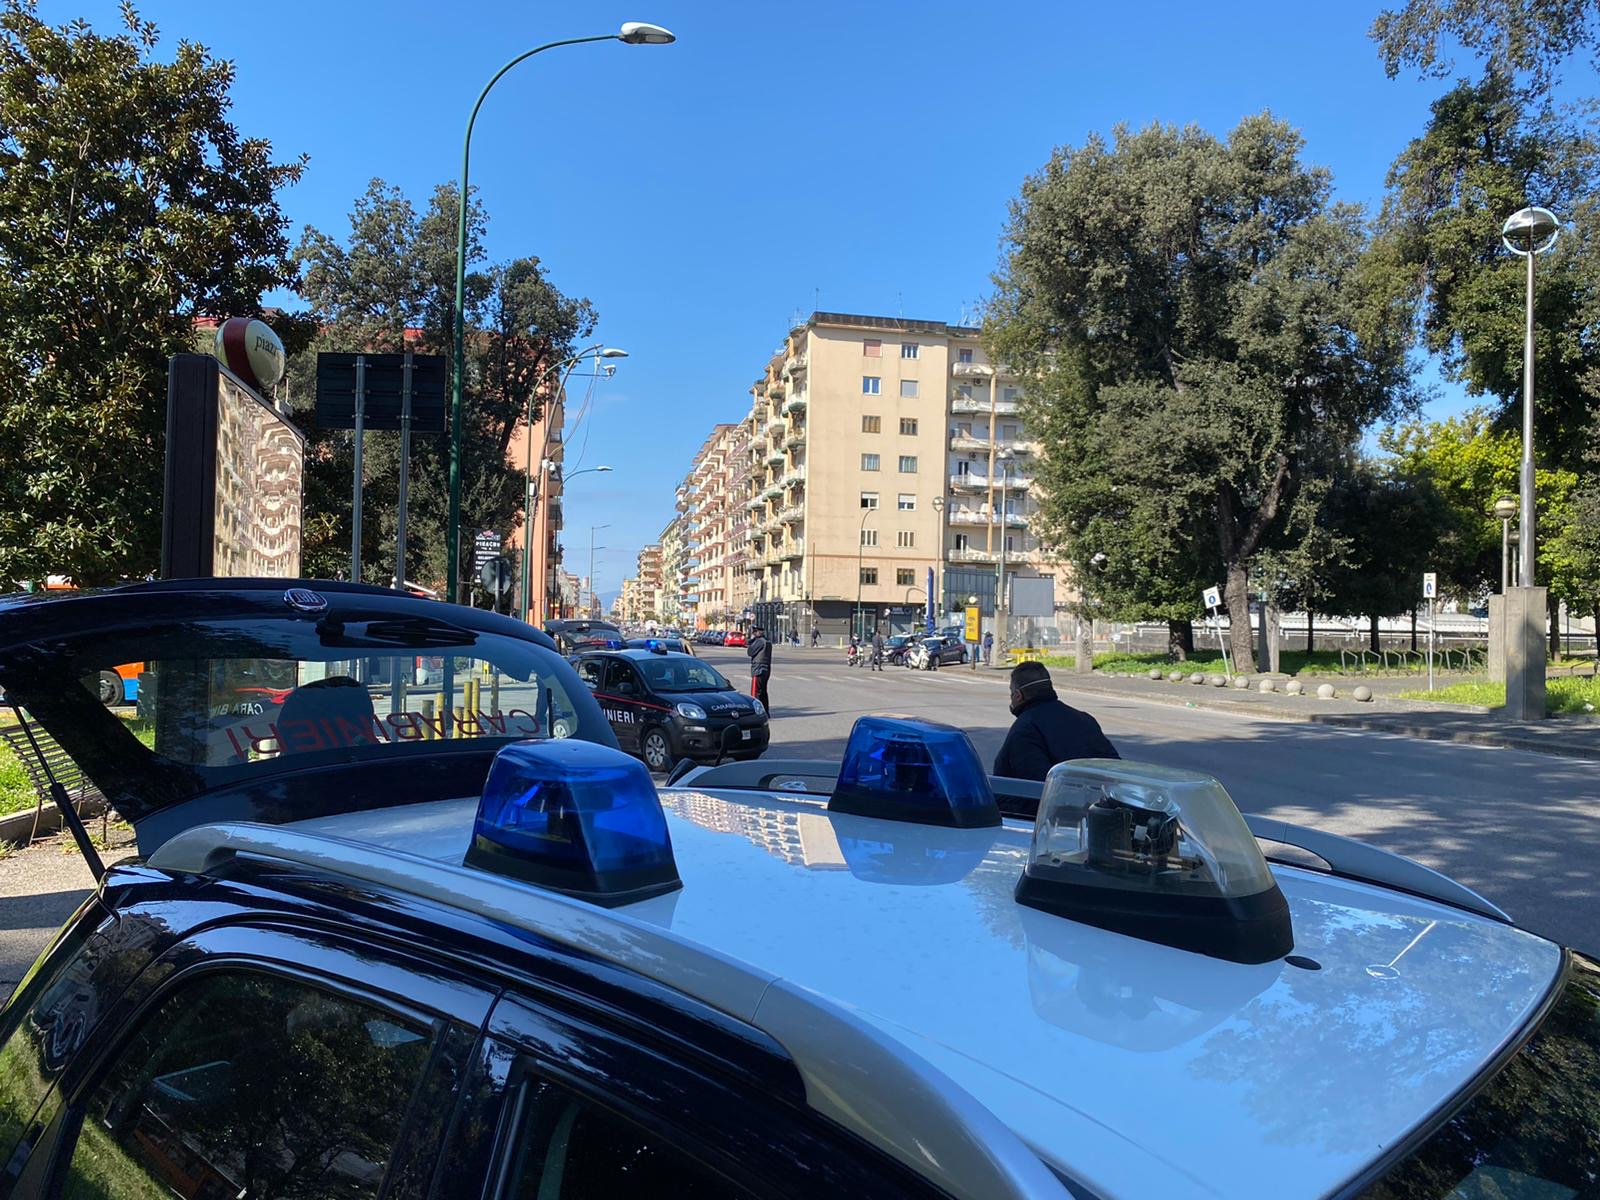 https://www.zerottounonews.it/wp-content/uploads/2020/07/controlli-carabinieri-napoli.jpg